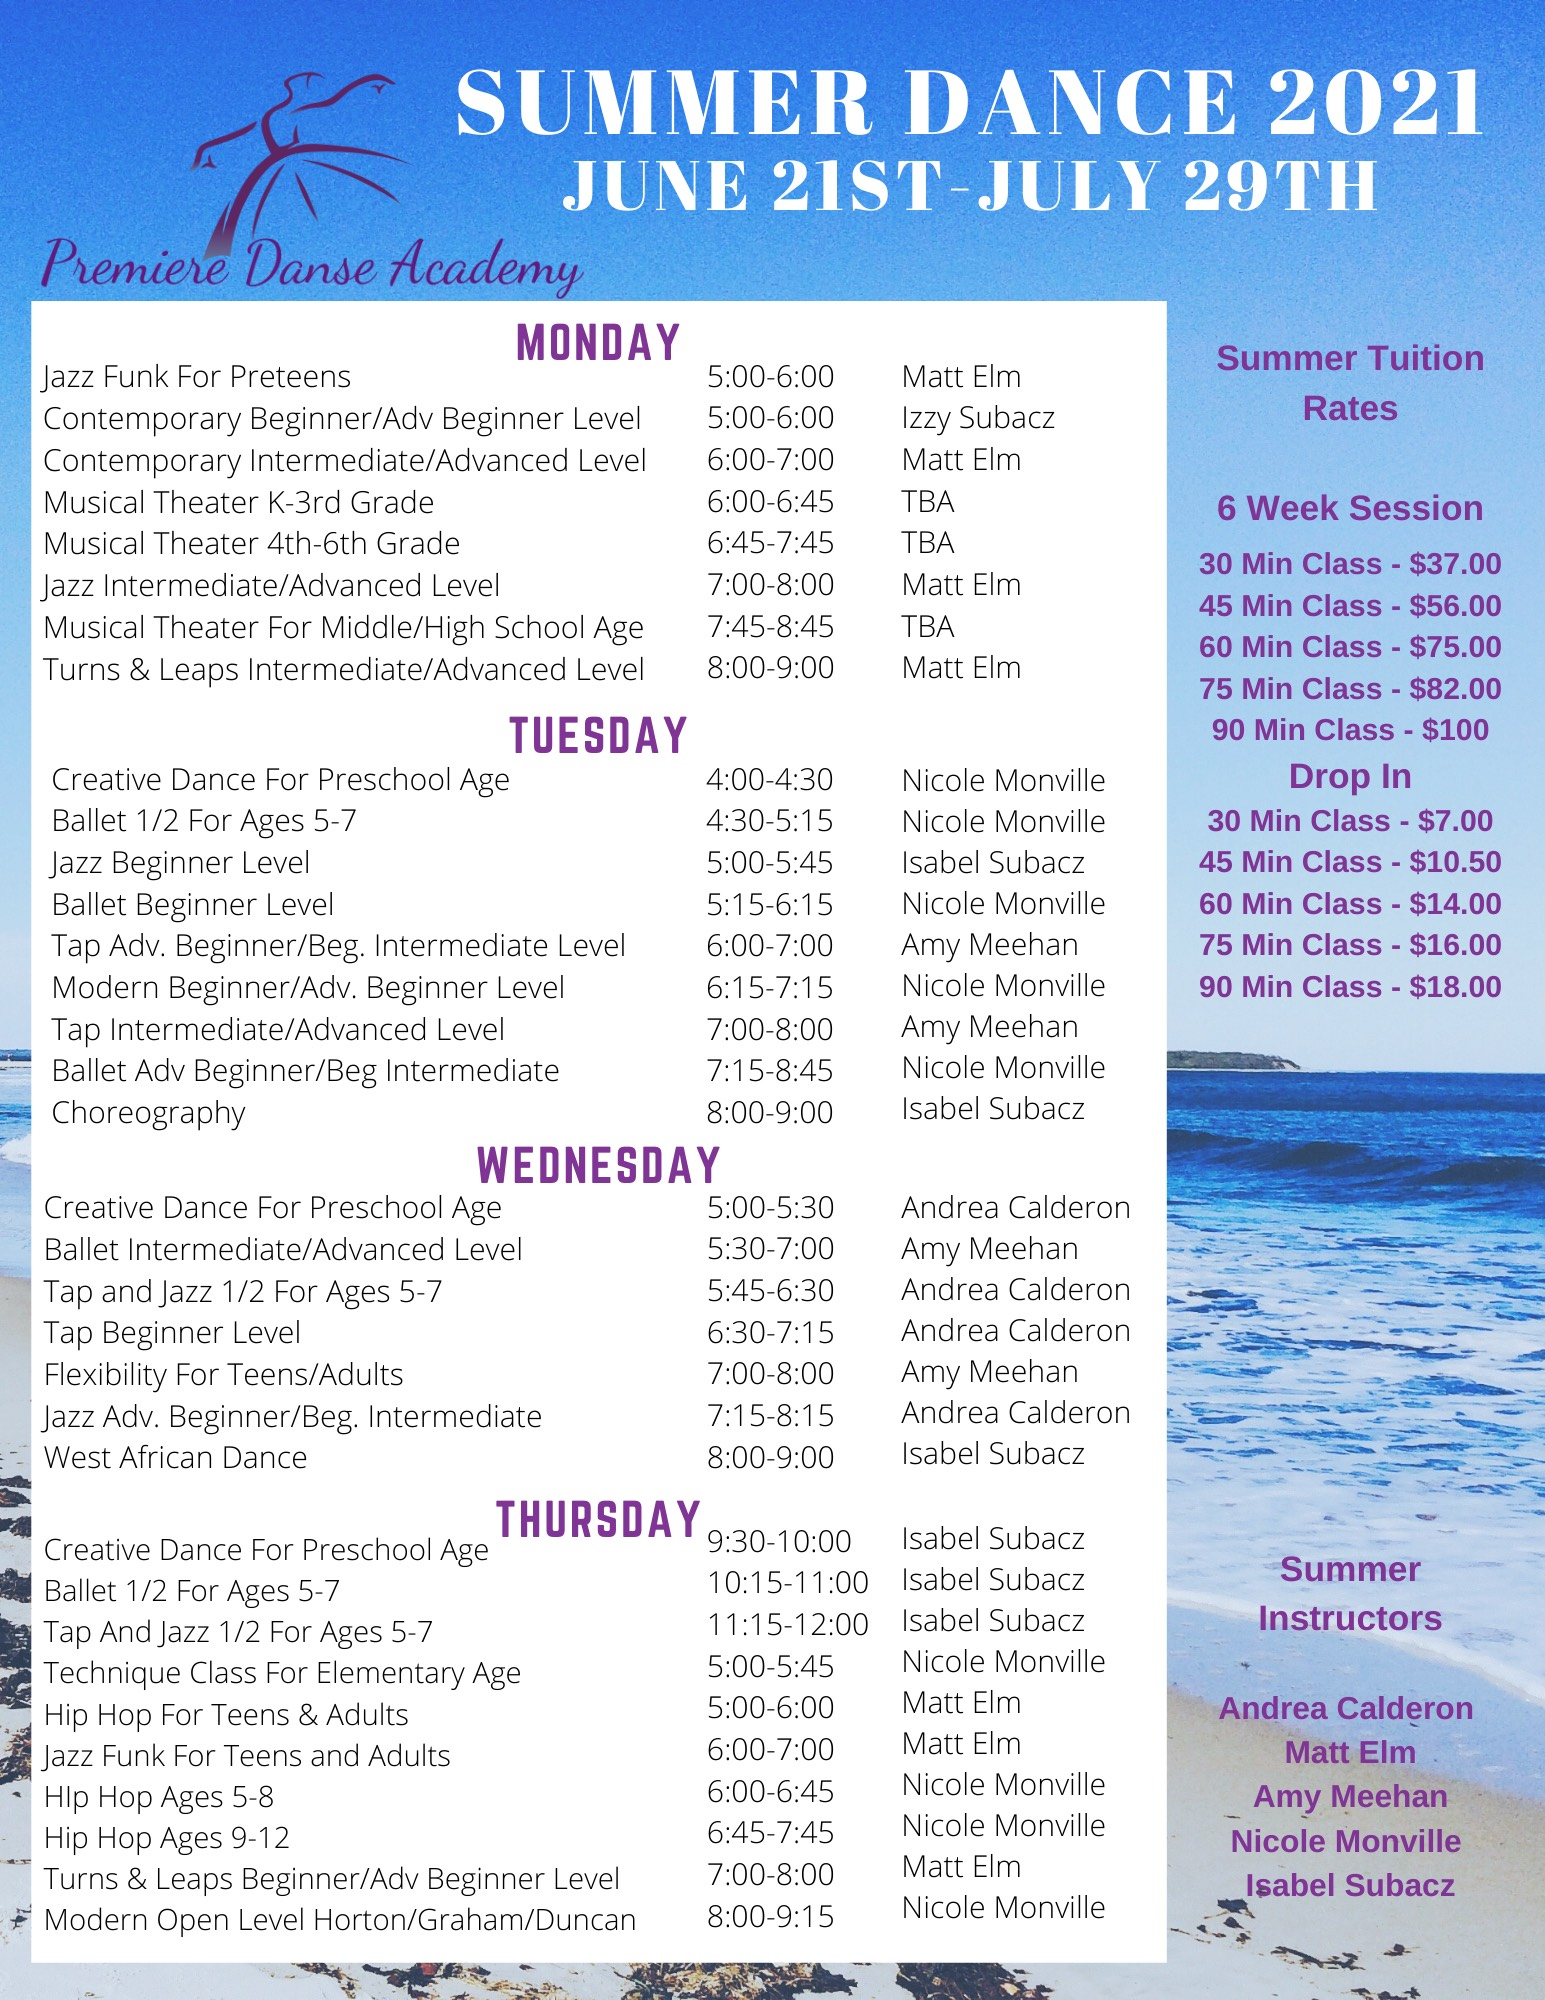 summer_schedule_2021.JPG Summer Class Schedule 202